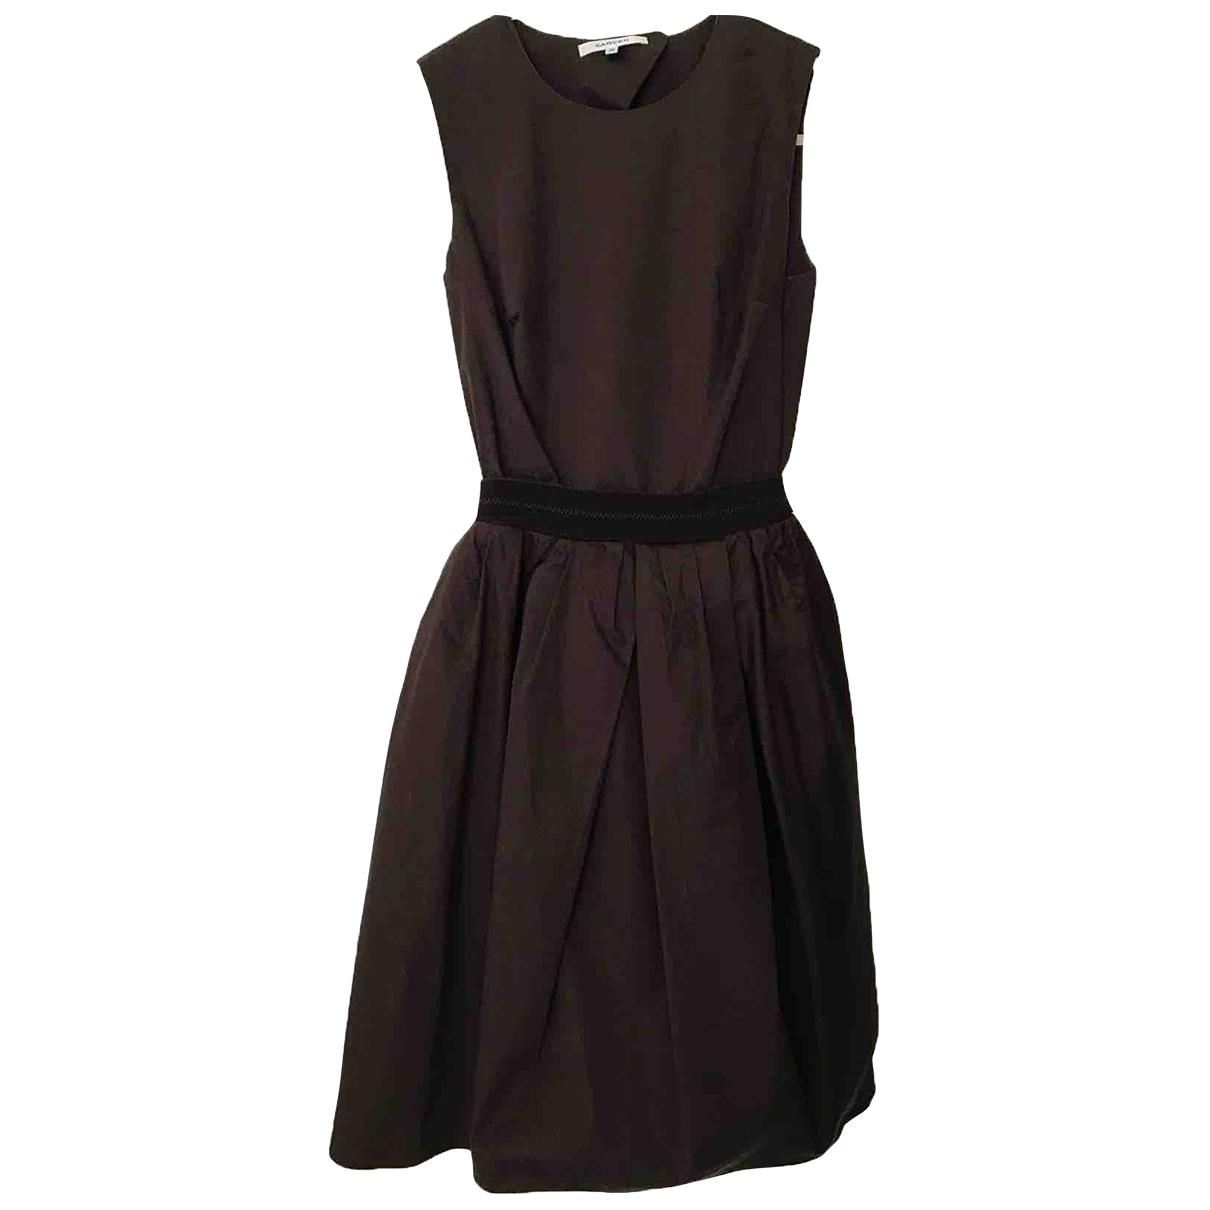 Carven \N Brown Cotton dress for Women 38 FR